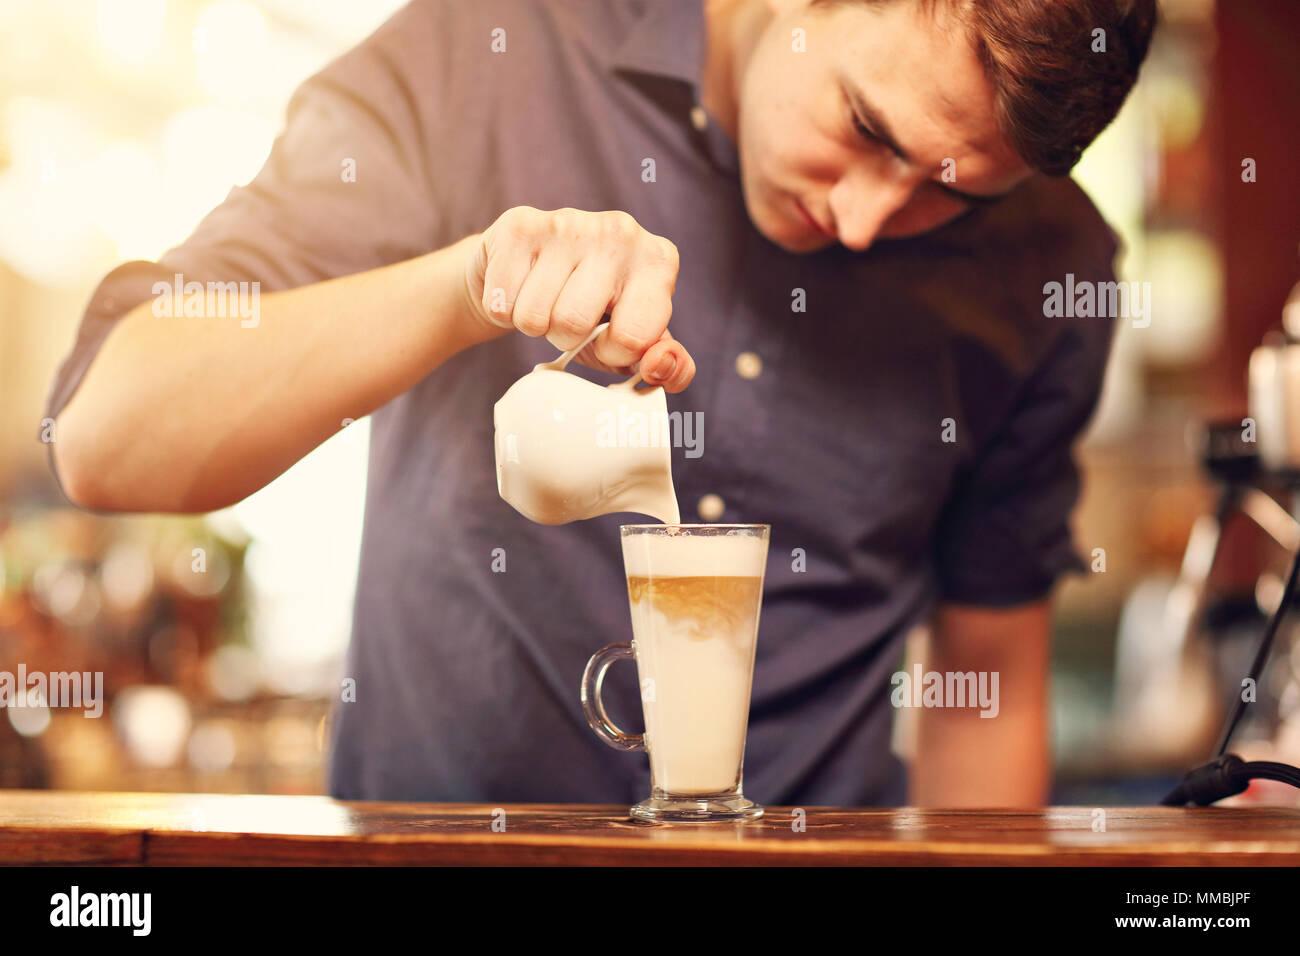 Barista Cafe machen Kaffee Zubereitung-Service-Konzept Stockbild